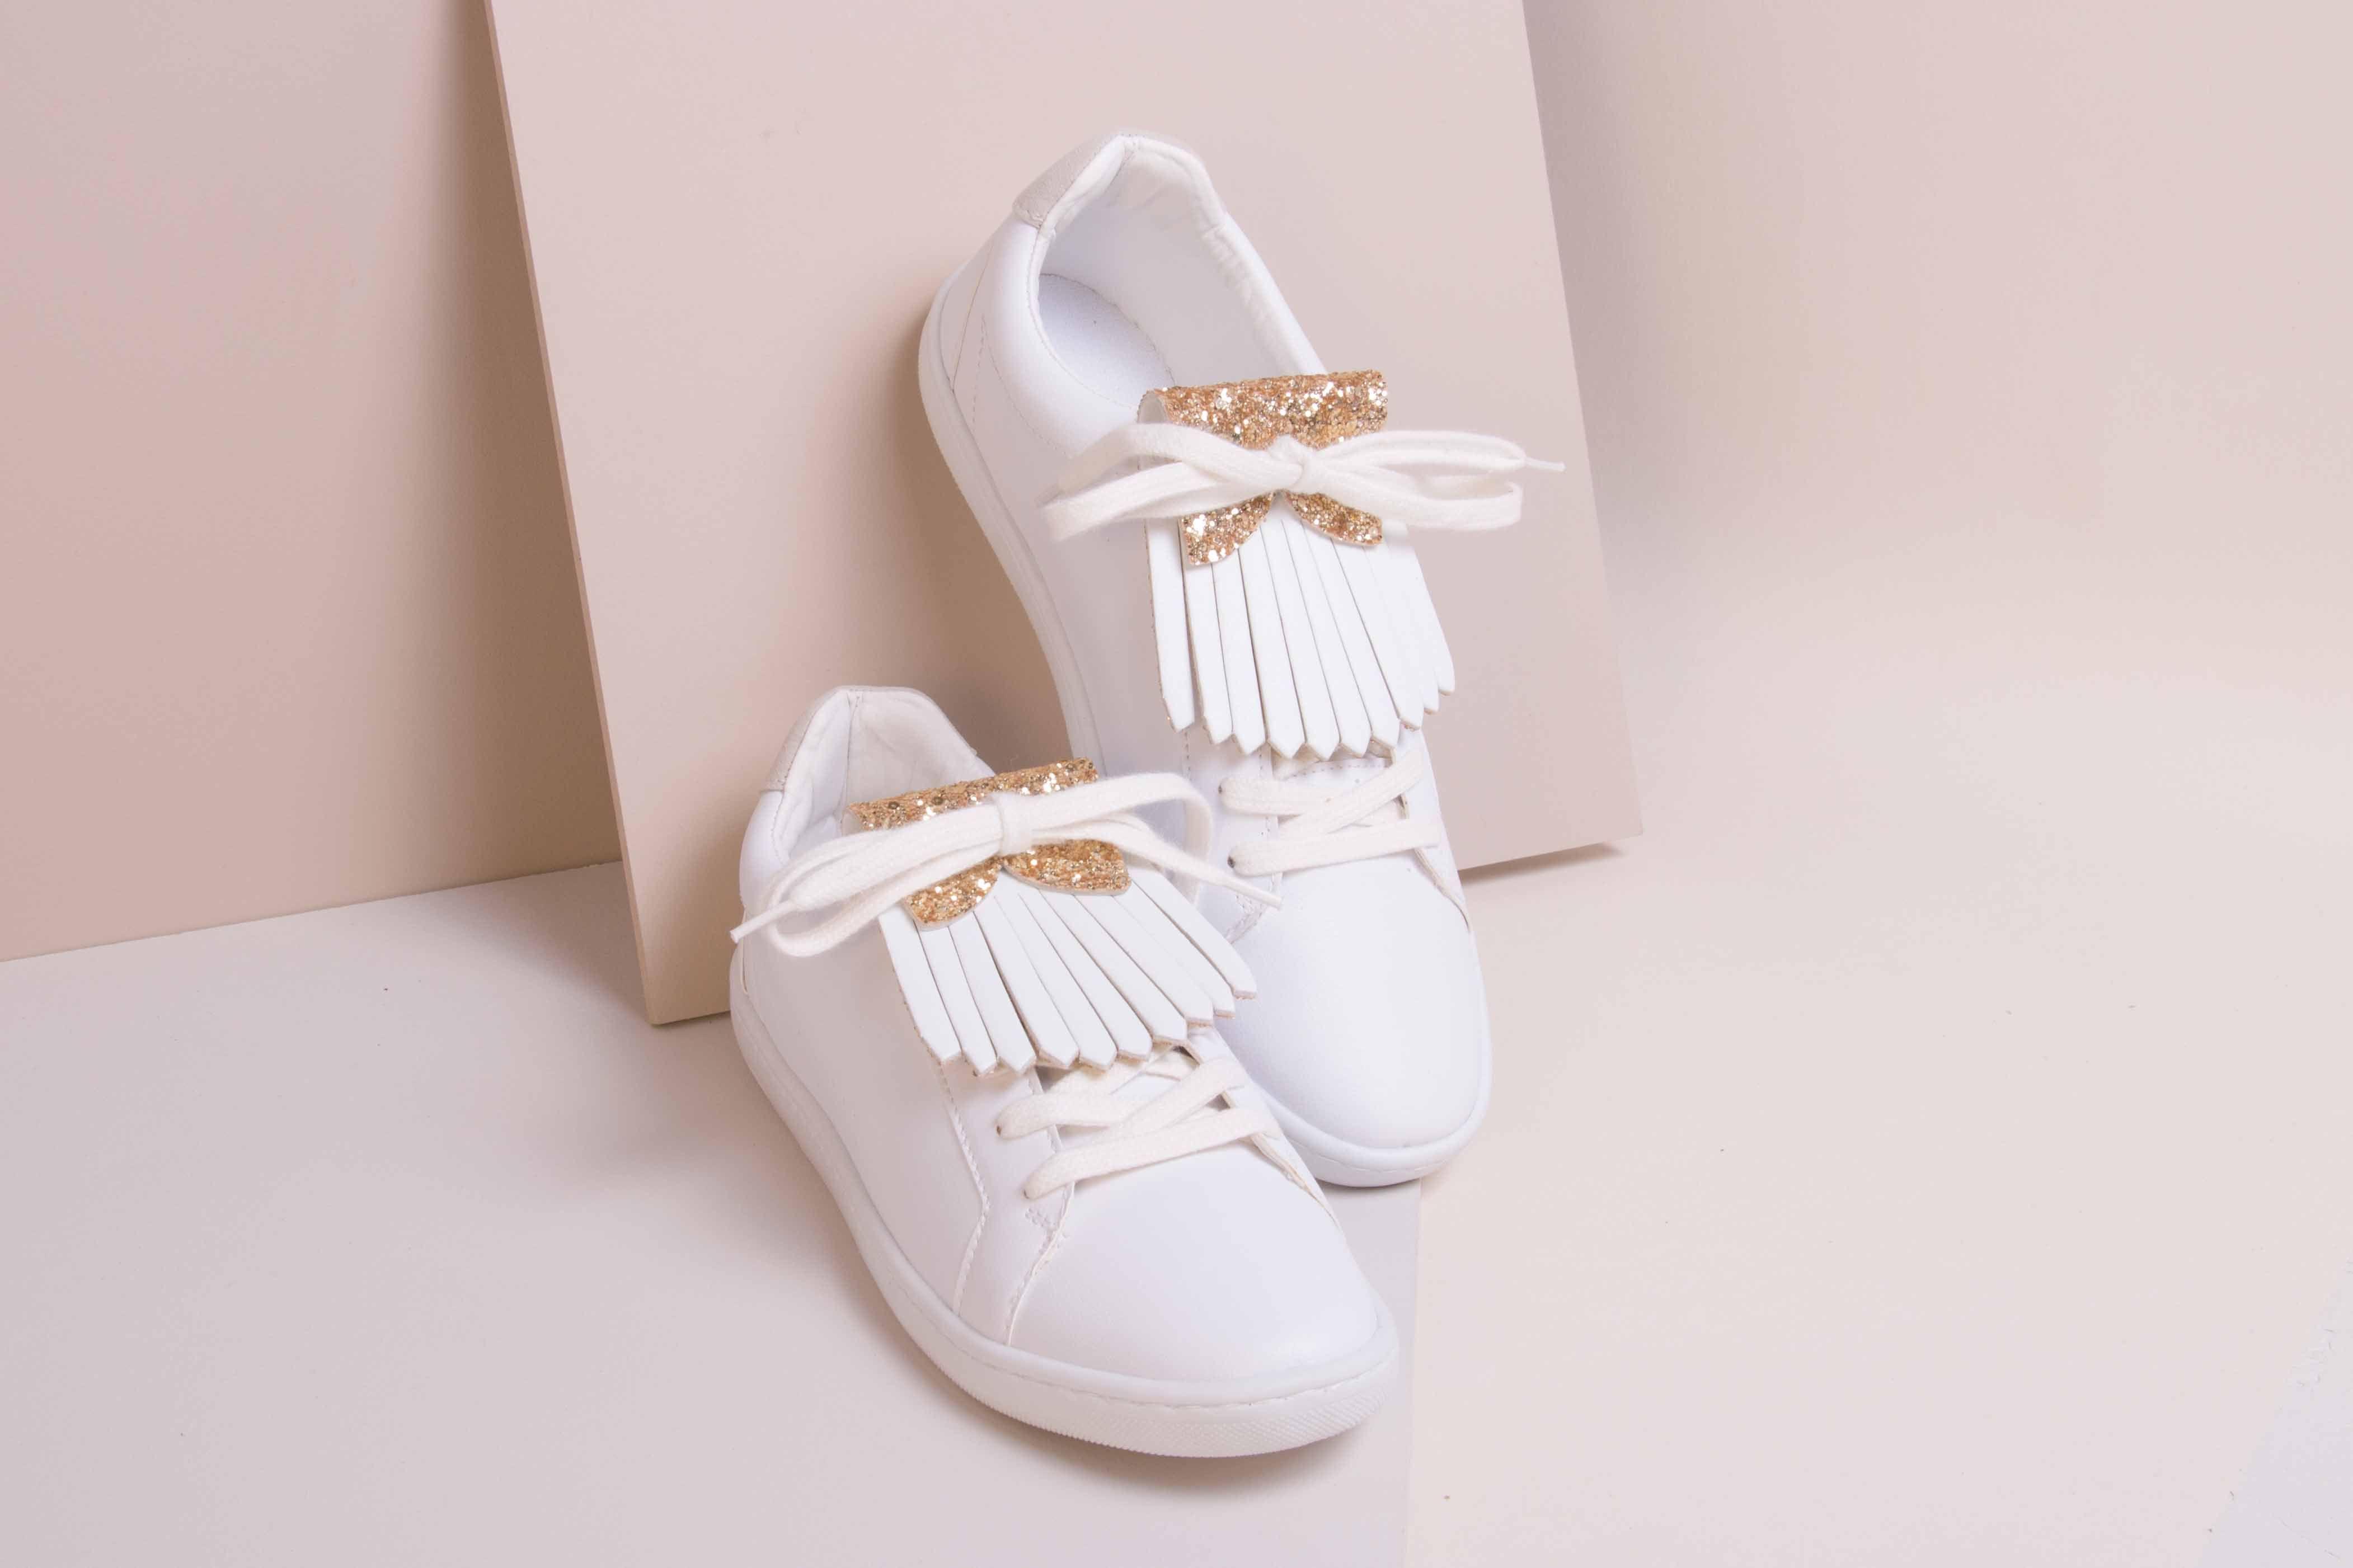 new products 9df33 5fc1f Franginettes cuir - Aurélie Chadaine réversibles glitter or blanc